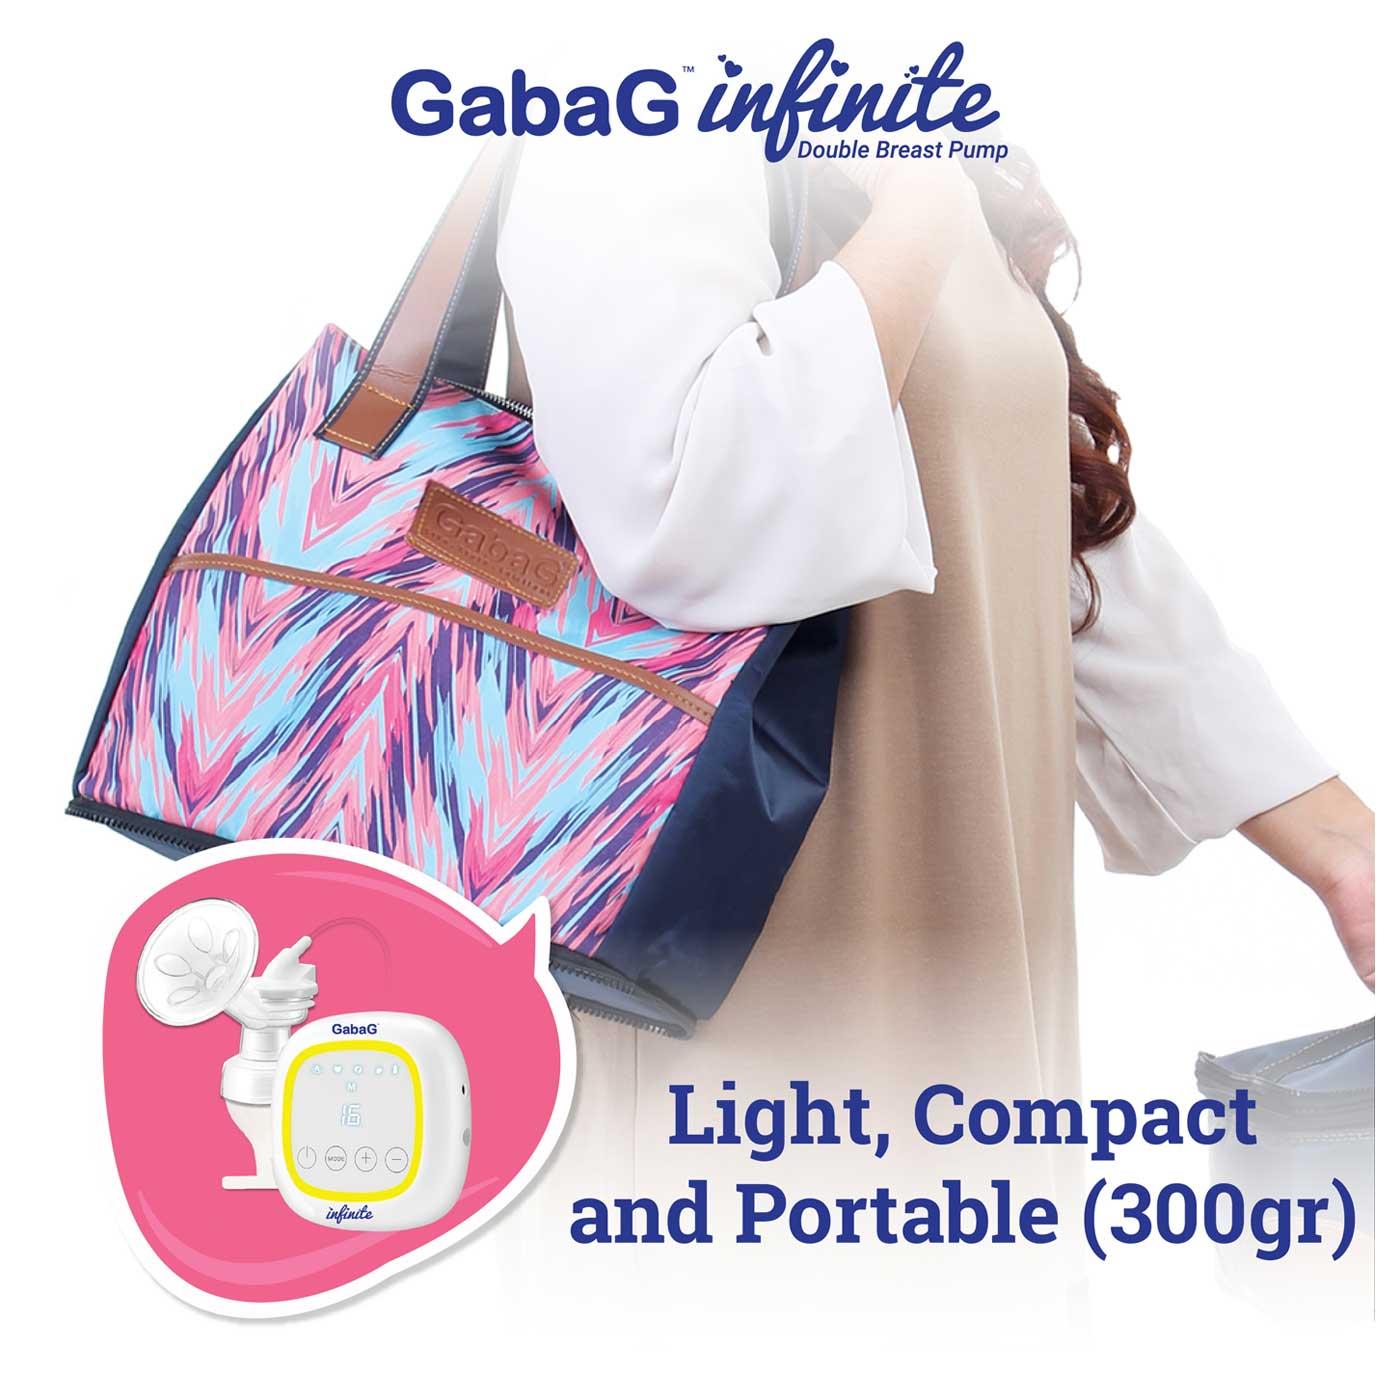 Gabag Infinite Double Breast Pump 4